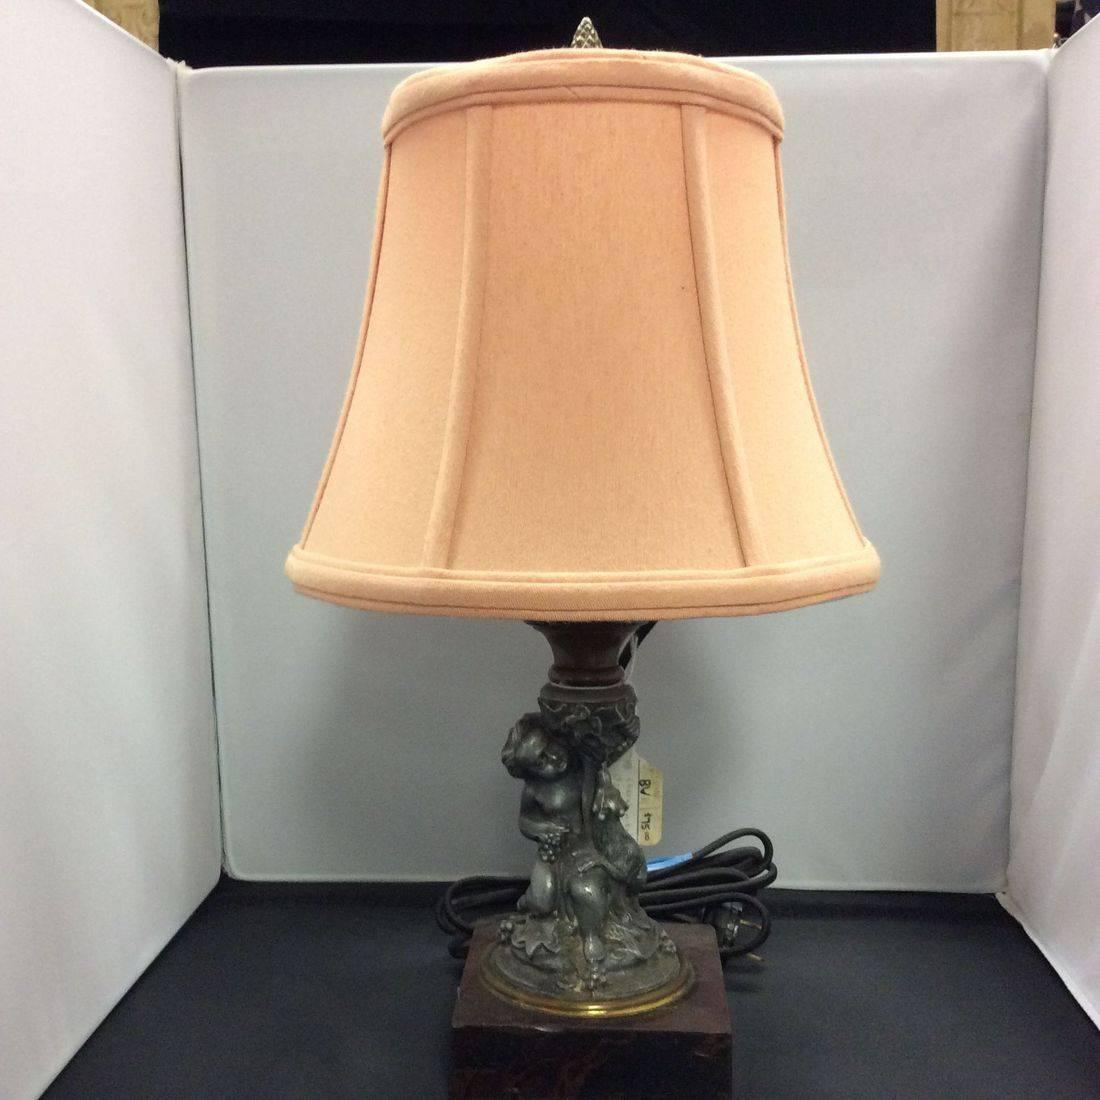 Early 1900's Cherub and Dog Lamp w/Marble Base  $75.00